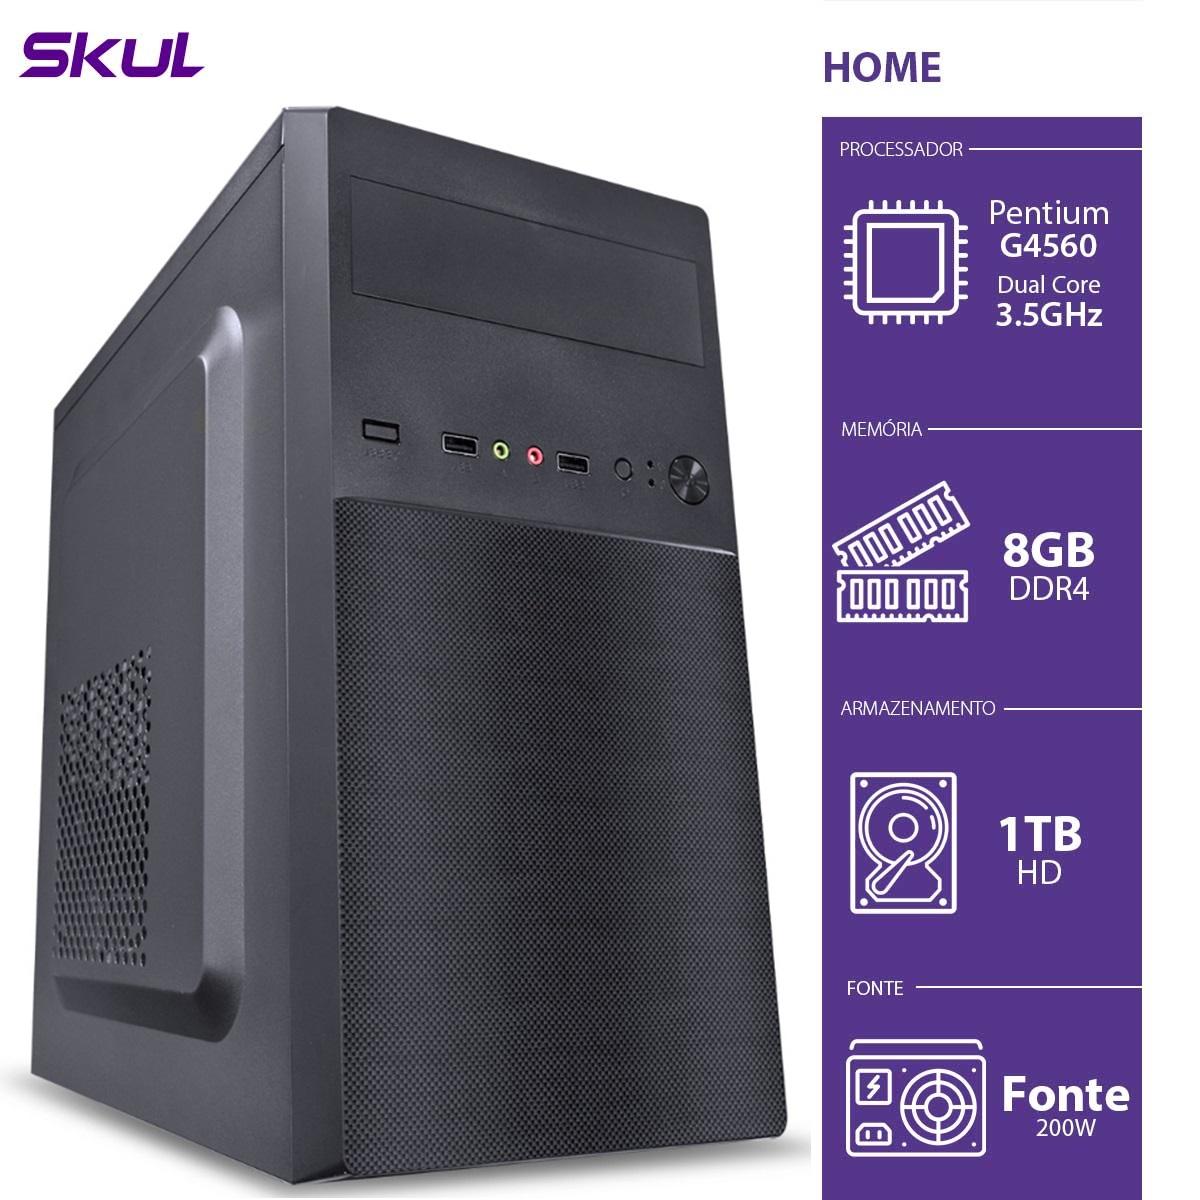 COMPUTADOR HOME H200 - PENTIUM DUAL CORE G4560 3.5GHZ 8GB DDR4 HD 1TB HDMI/VGA FONTE 200W